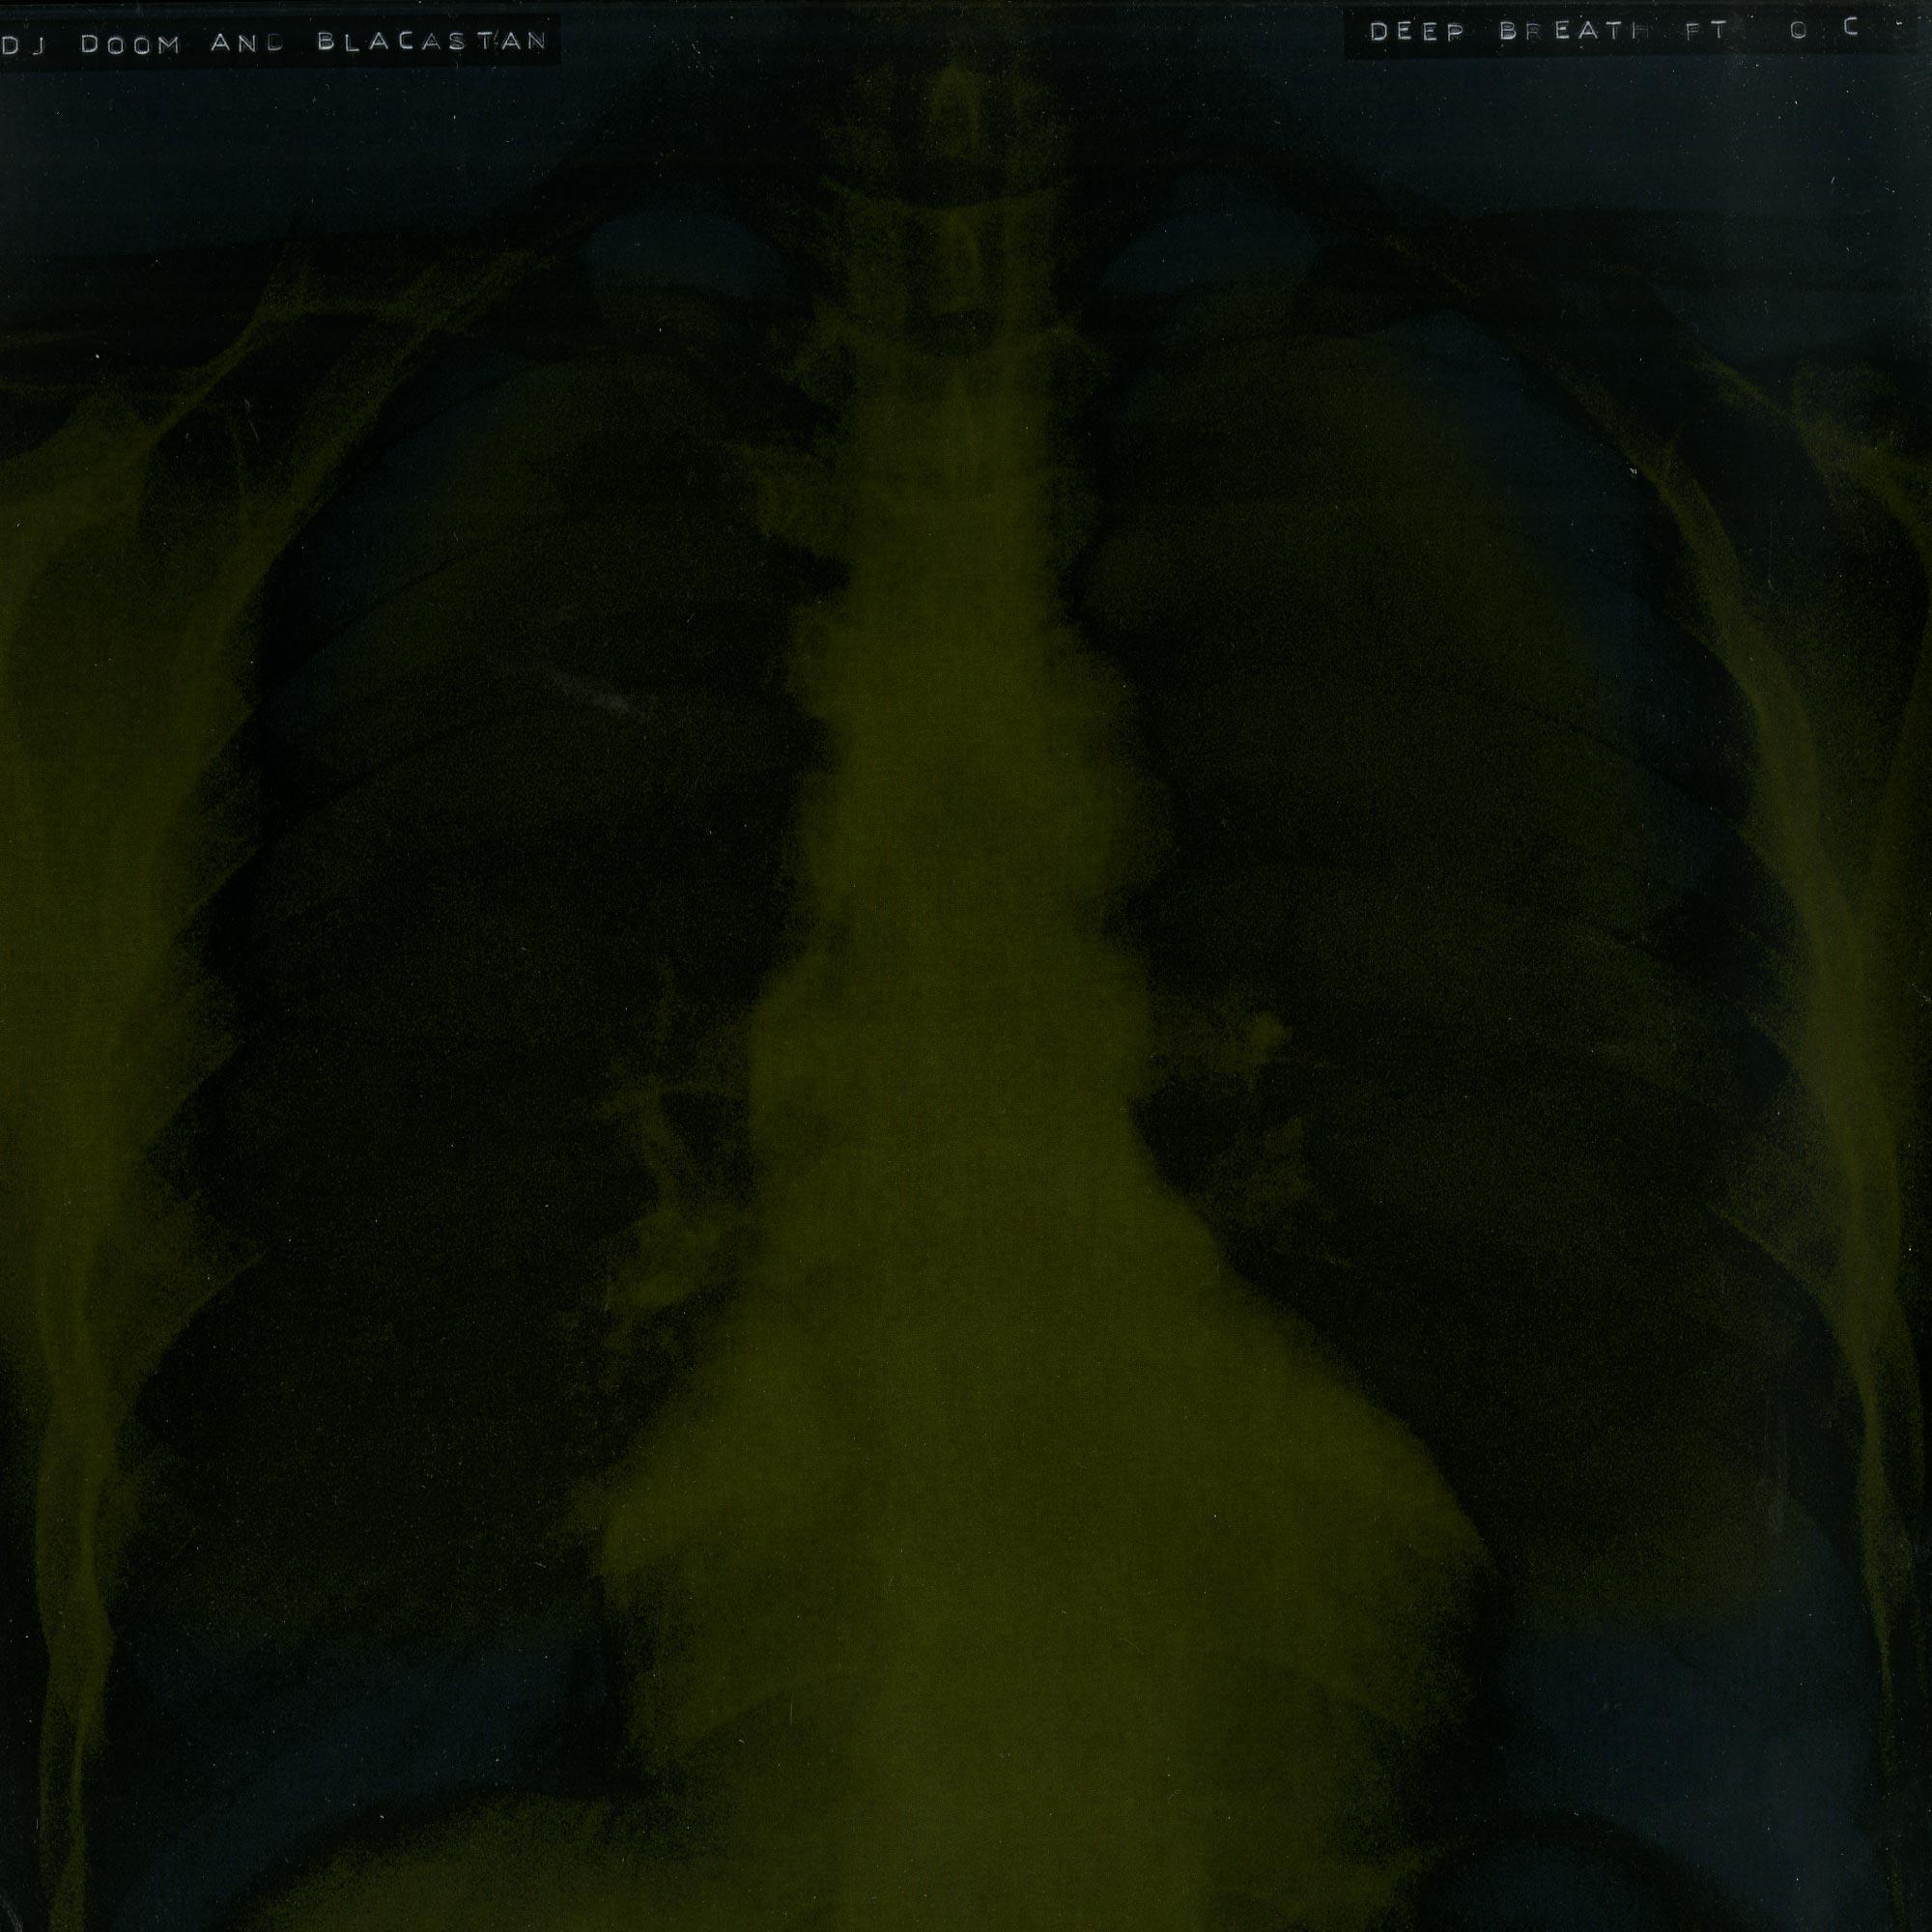 DJ Doom & Blacastan - DEEP BREATH / PASSIVE AGGRESSION